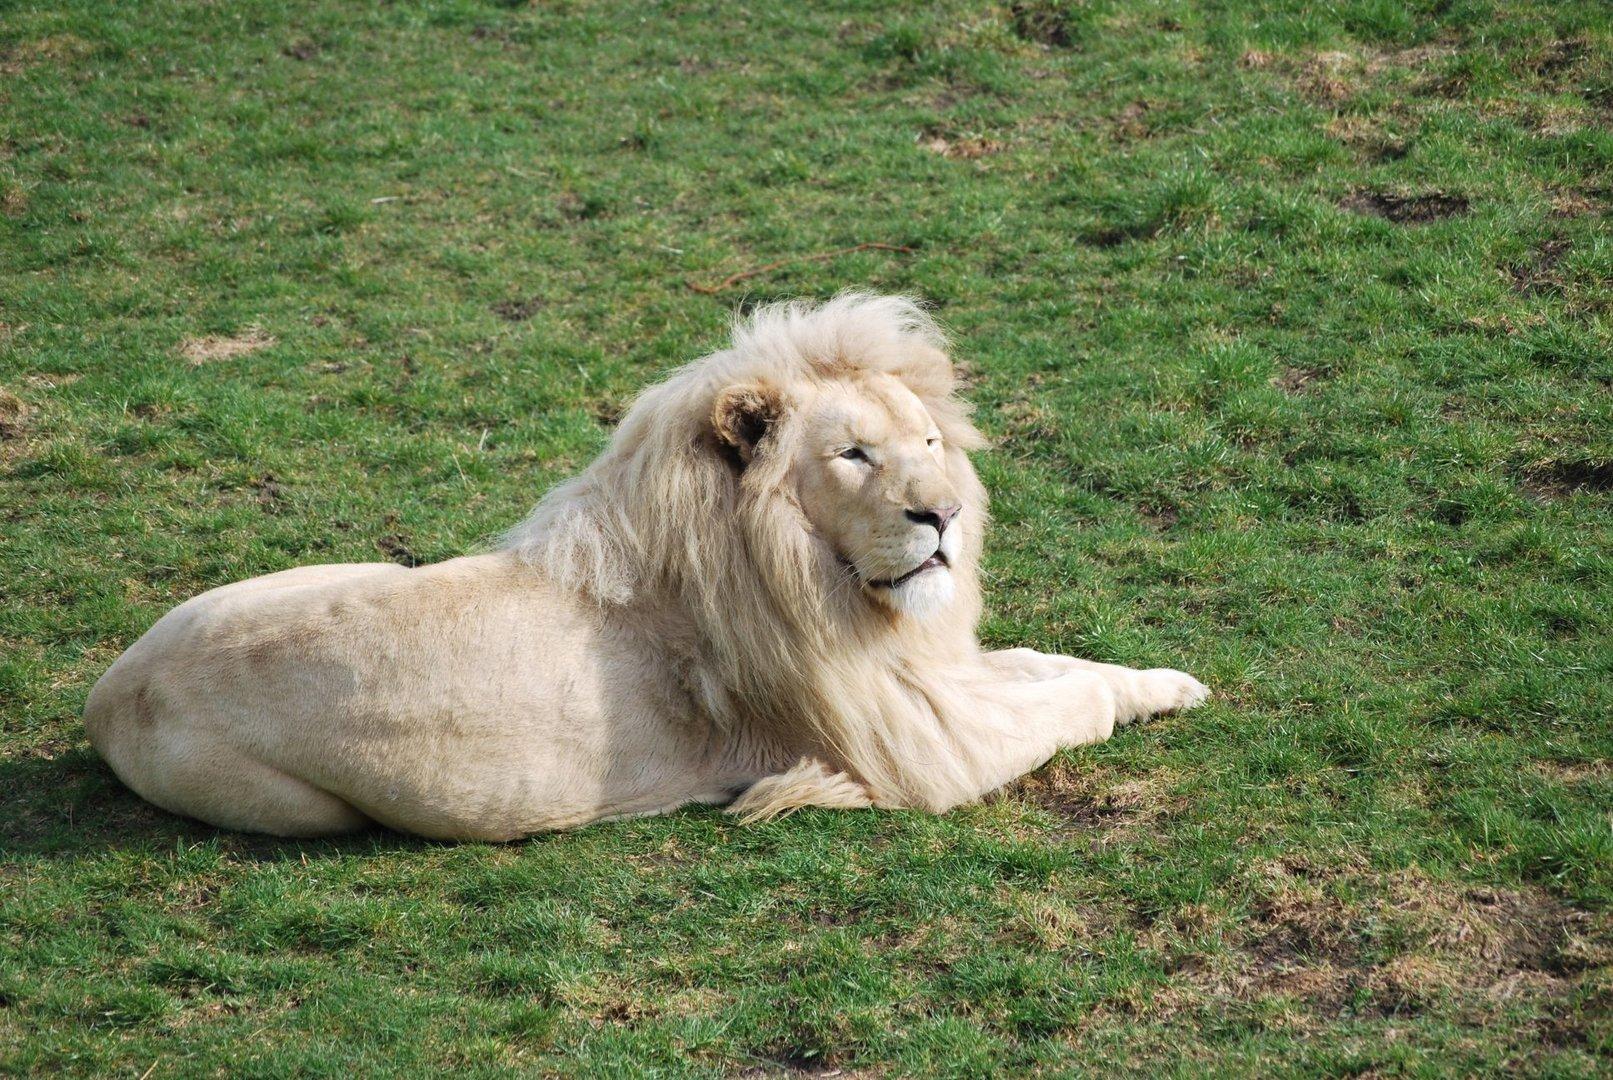 Weißer Löwe (Safaripark)